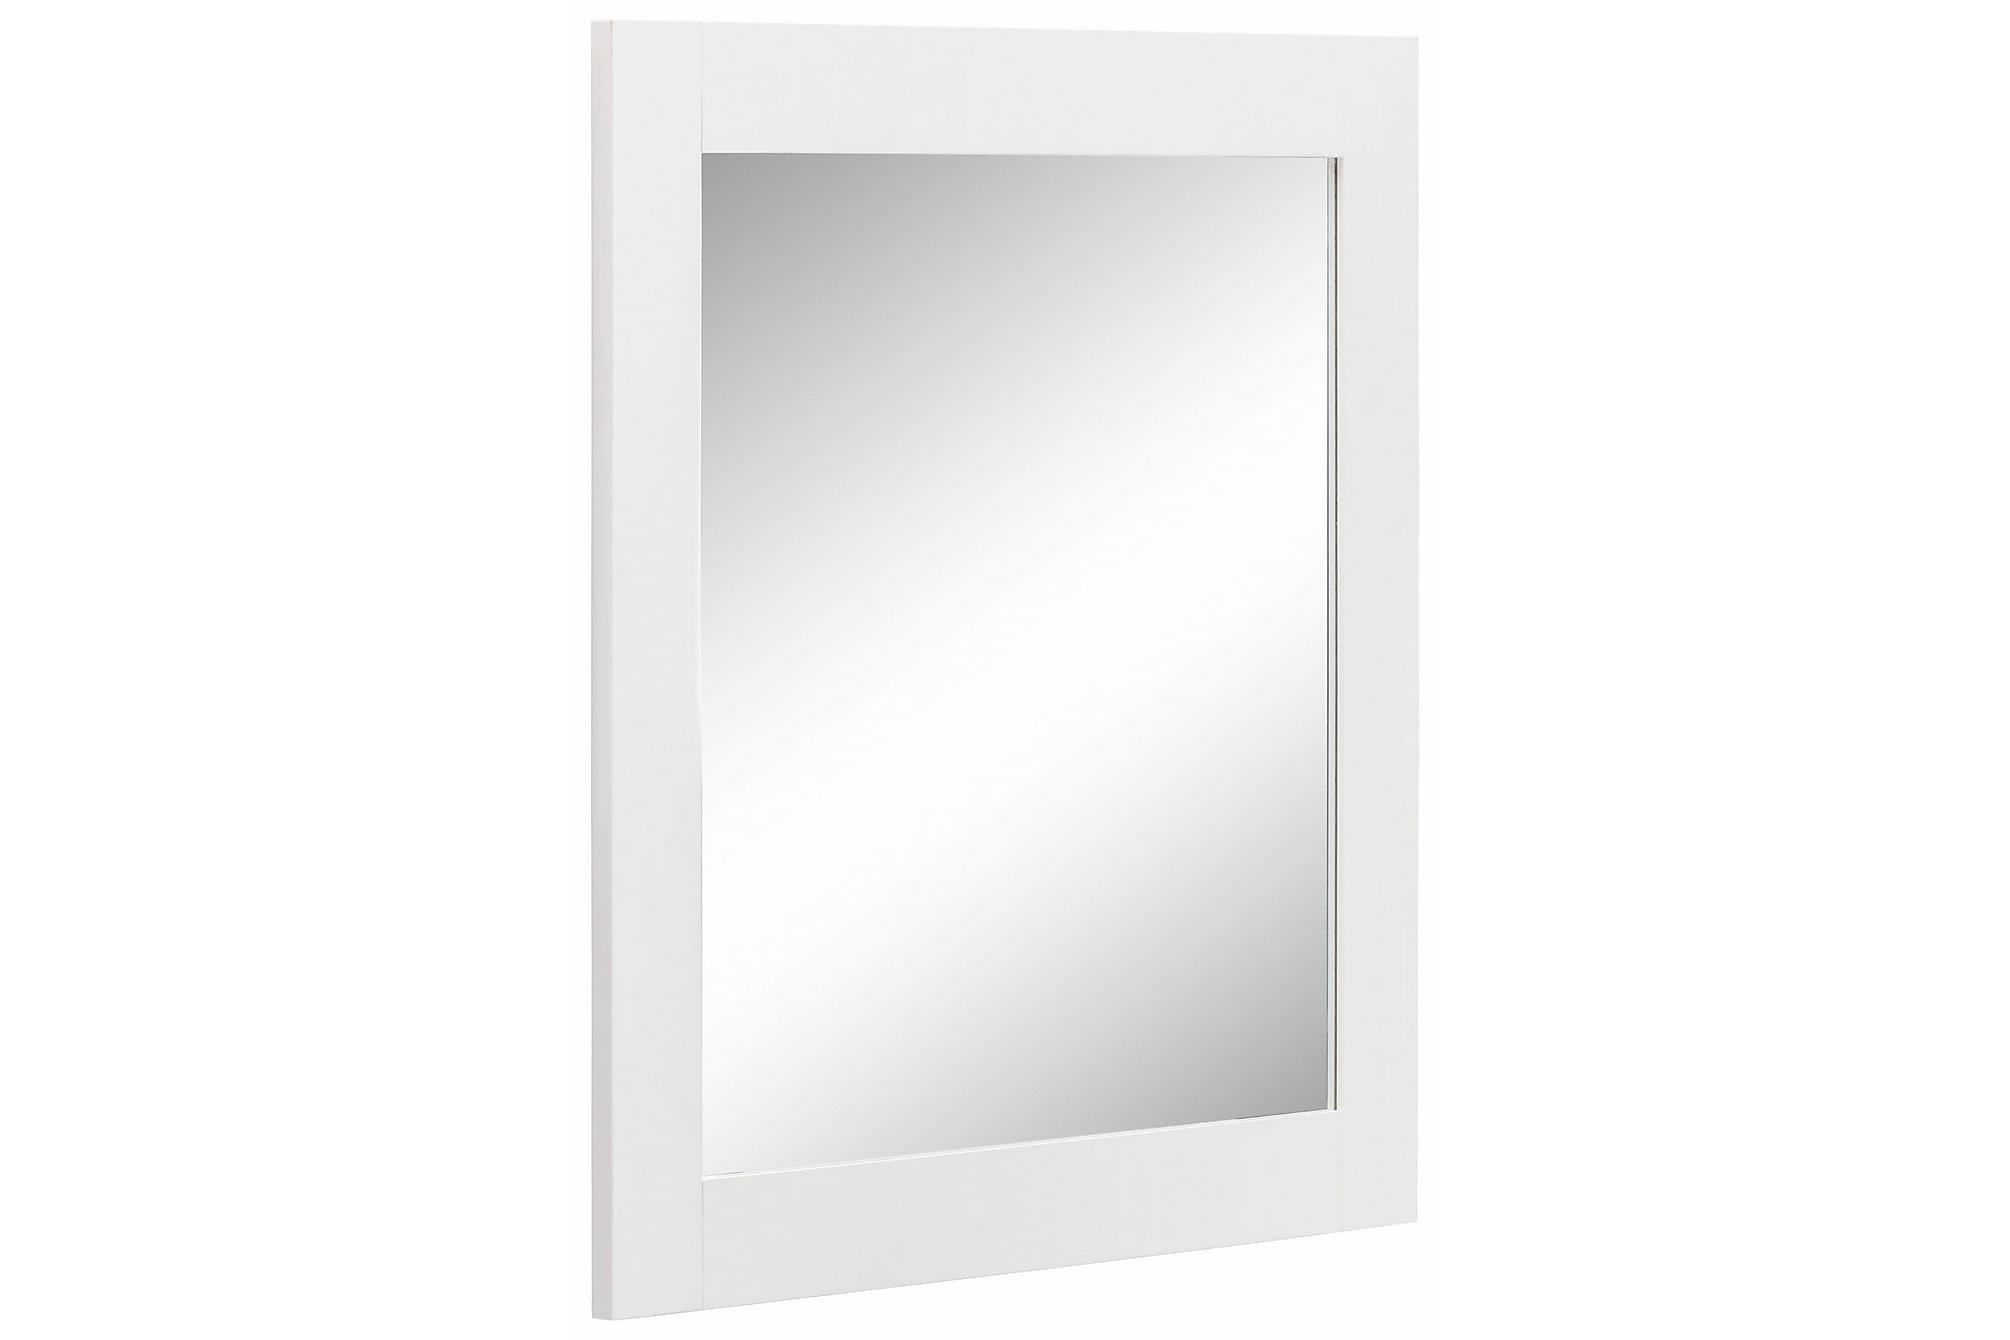 BOOTH Spegel 60 Vit, Speglar